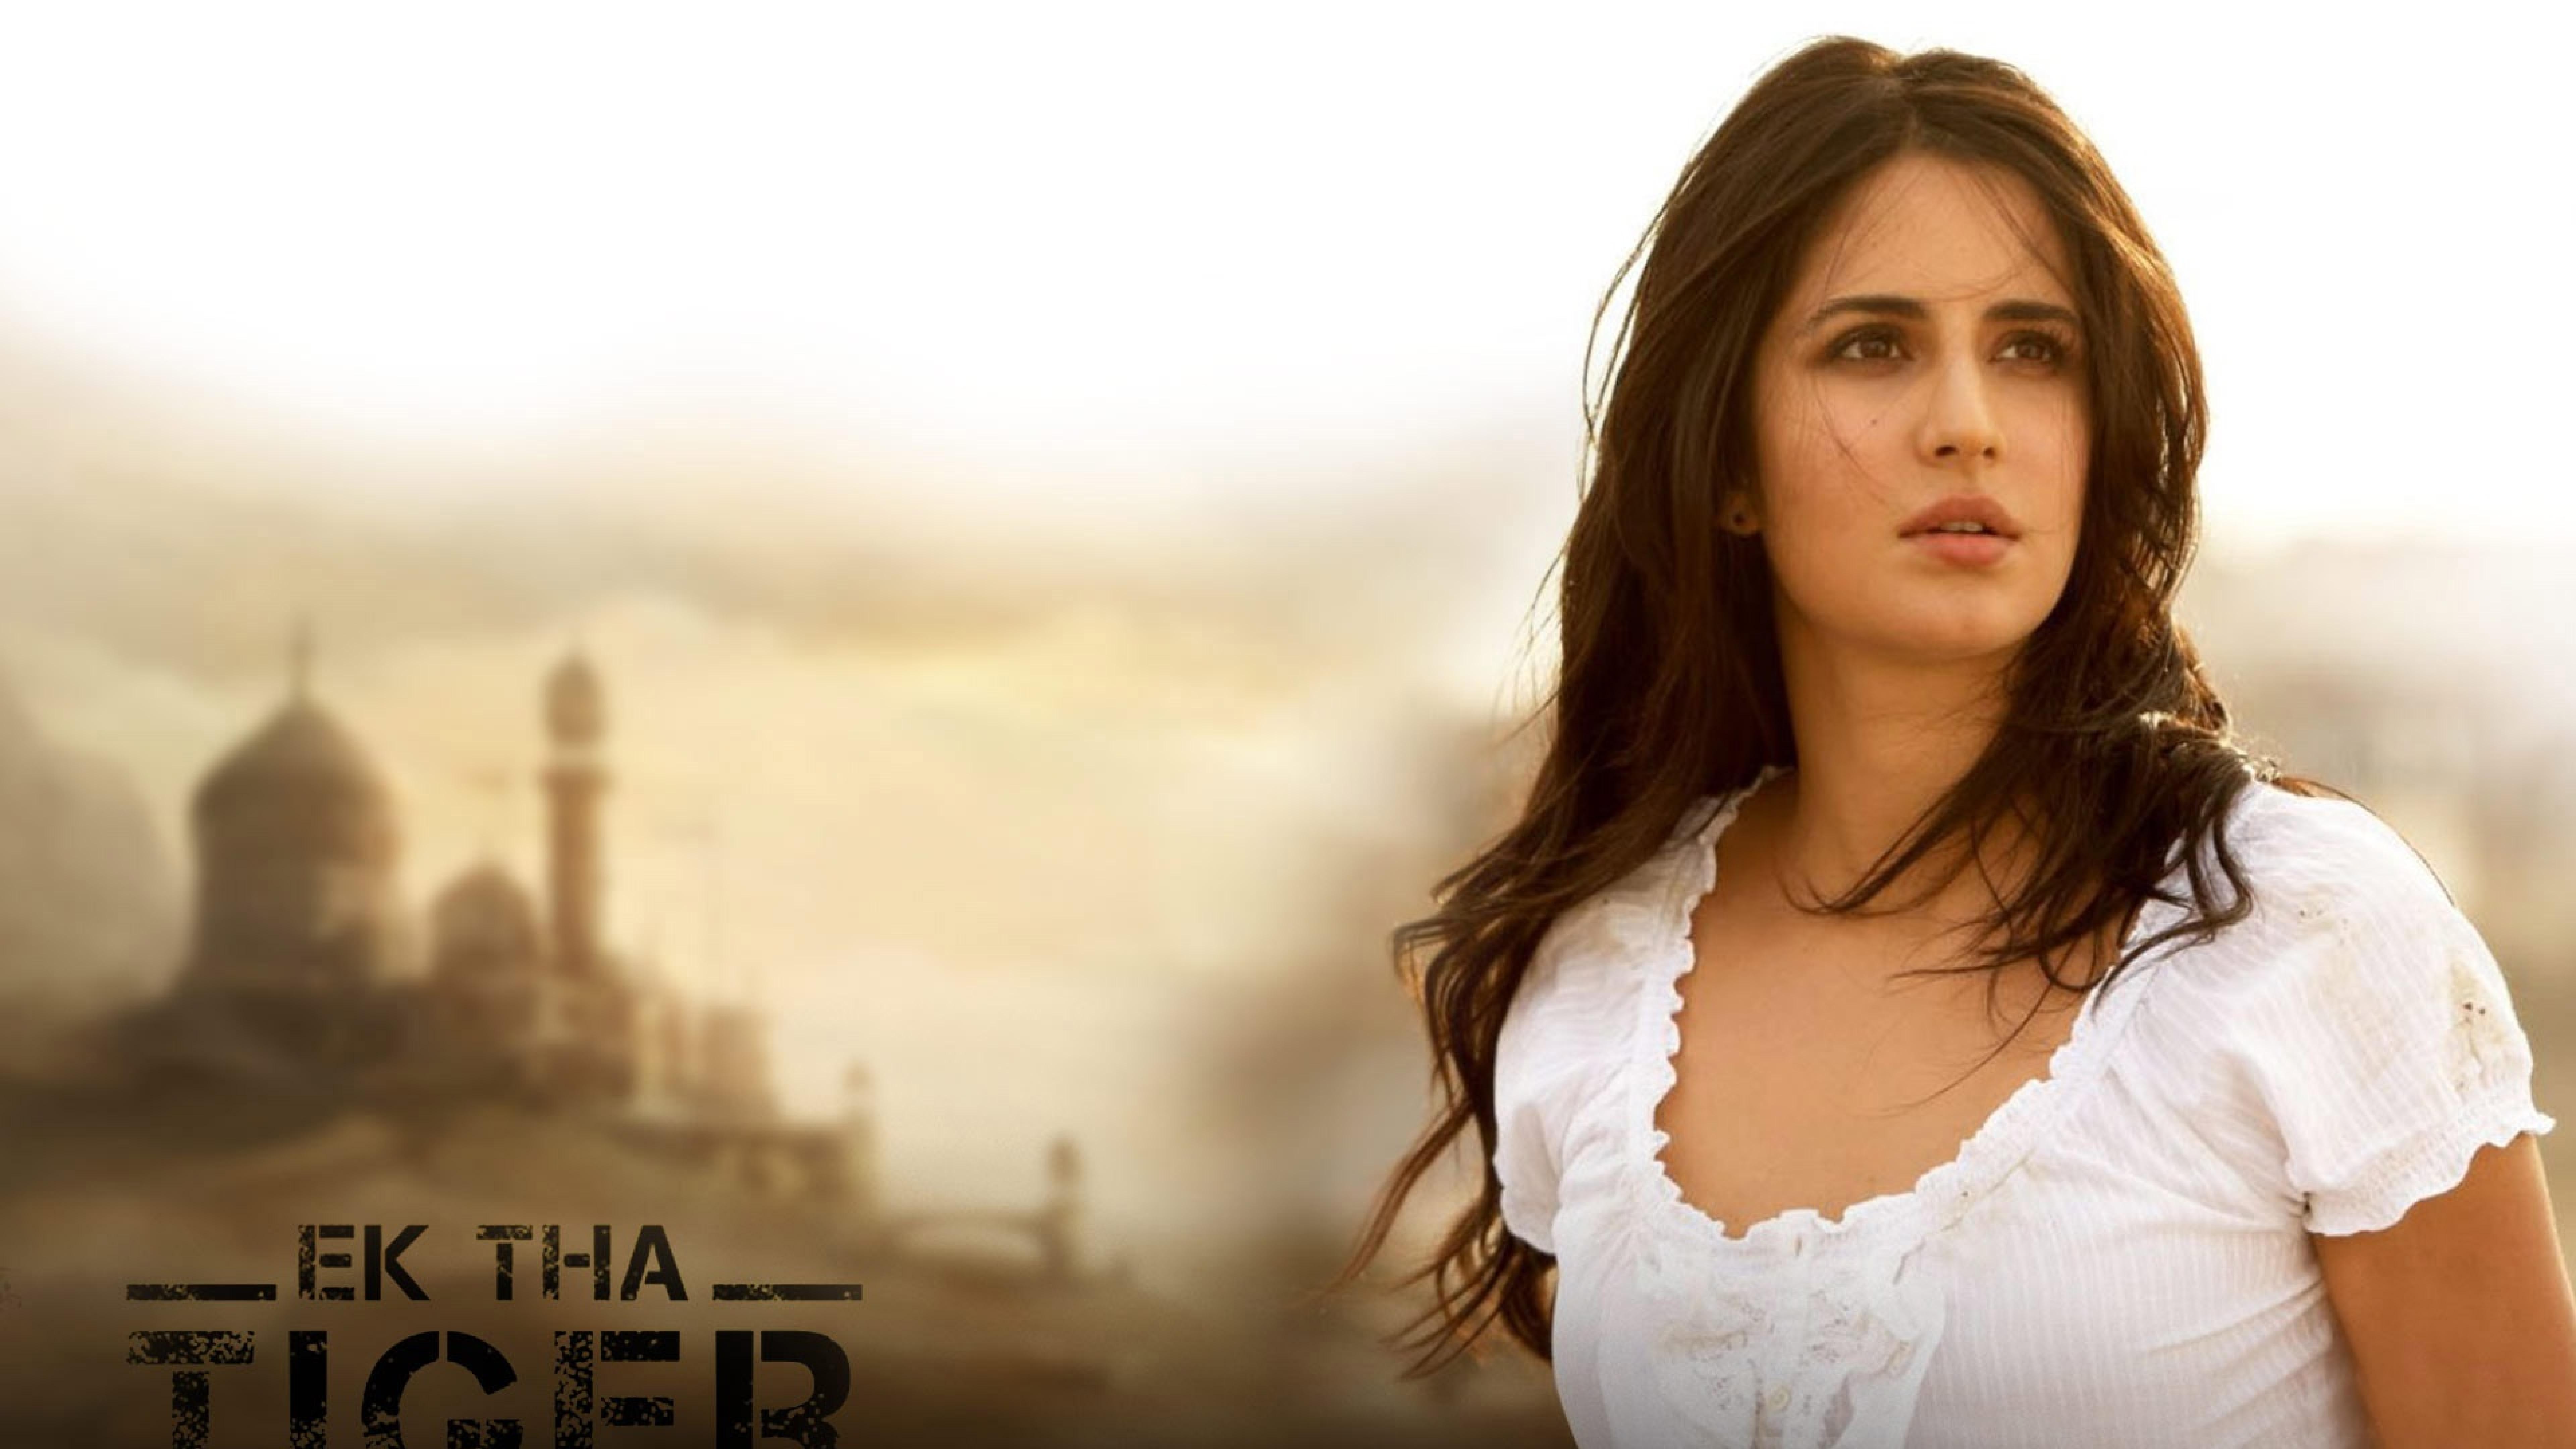 Katrina Kaif In Ek Tha Tiger, Full Hd Wallpaper-7420